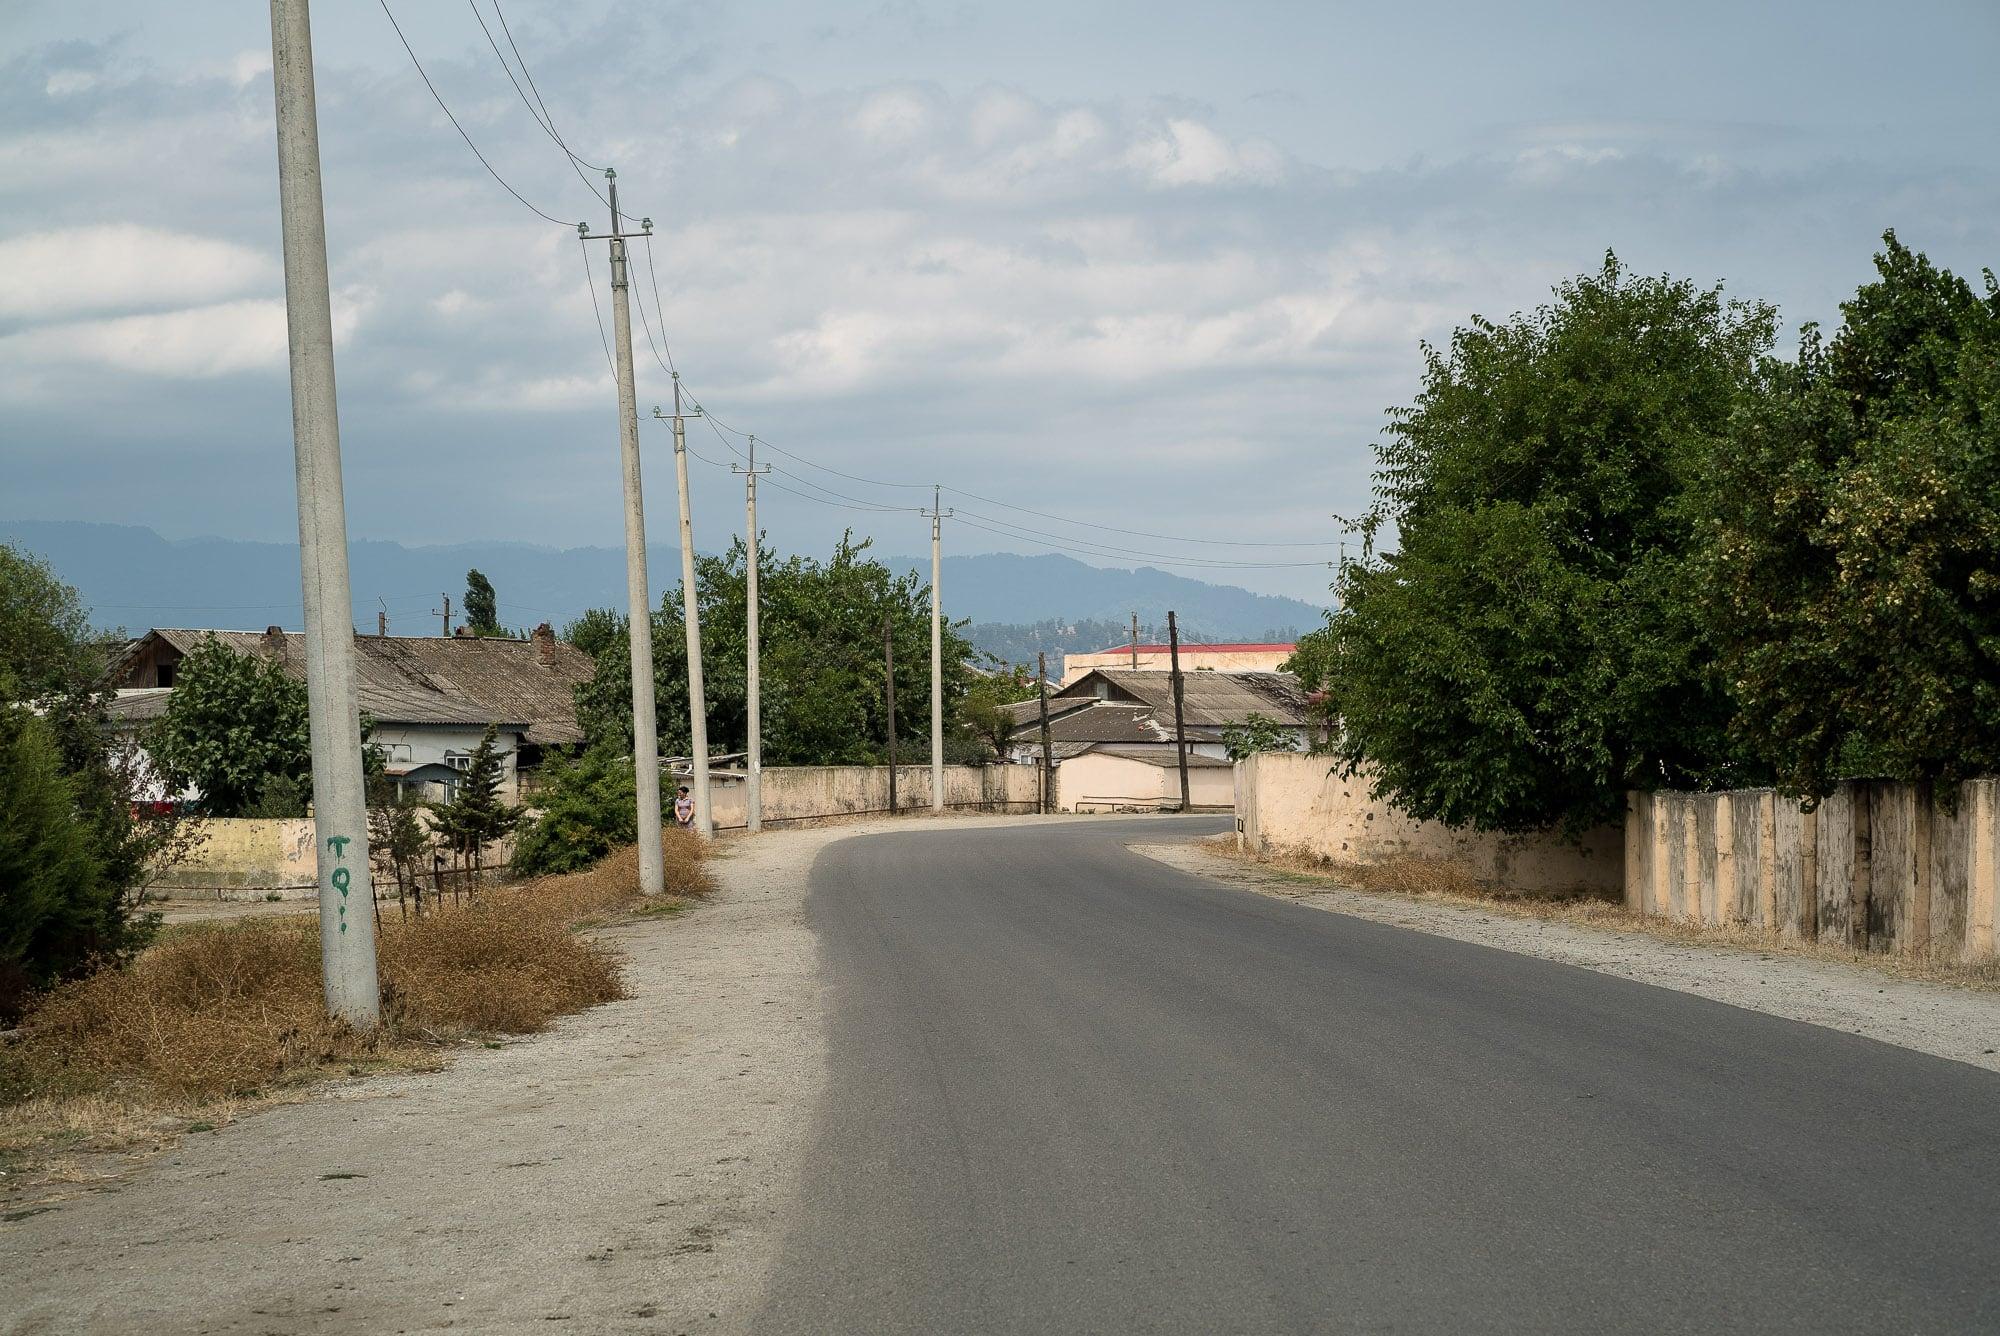 road in Azerbaijan